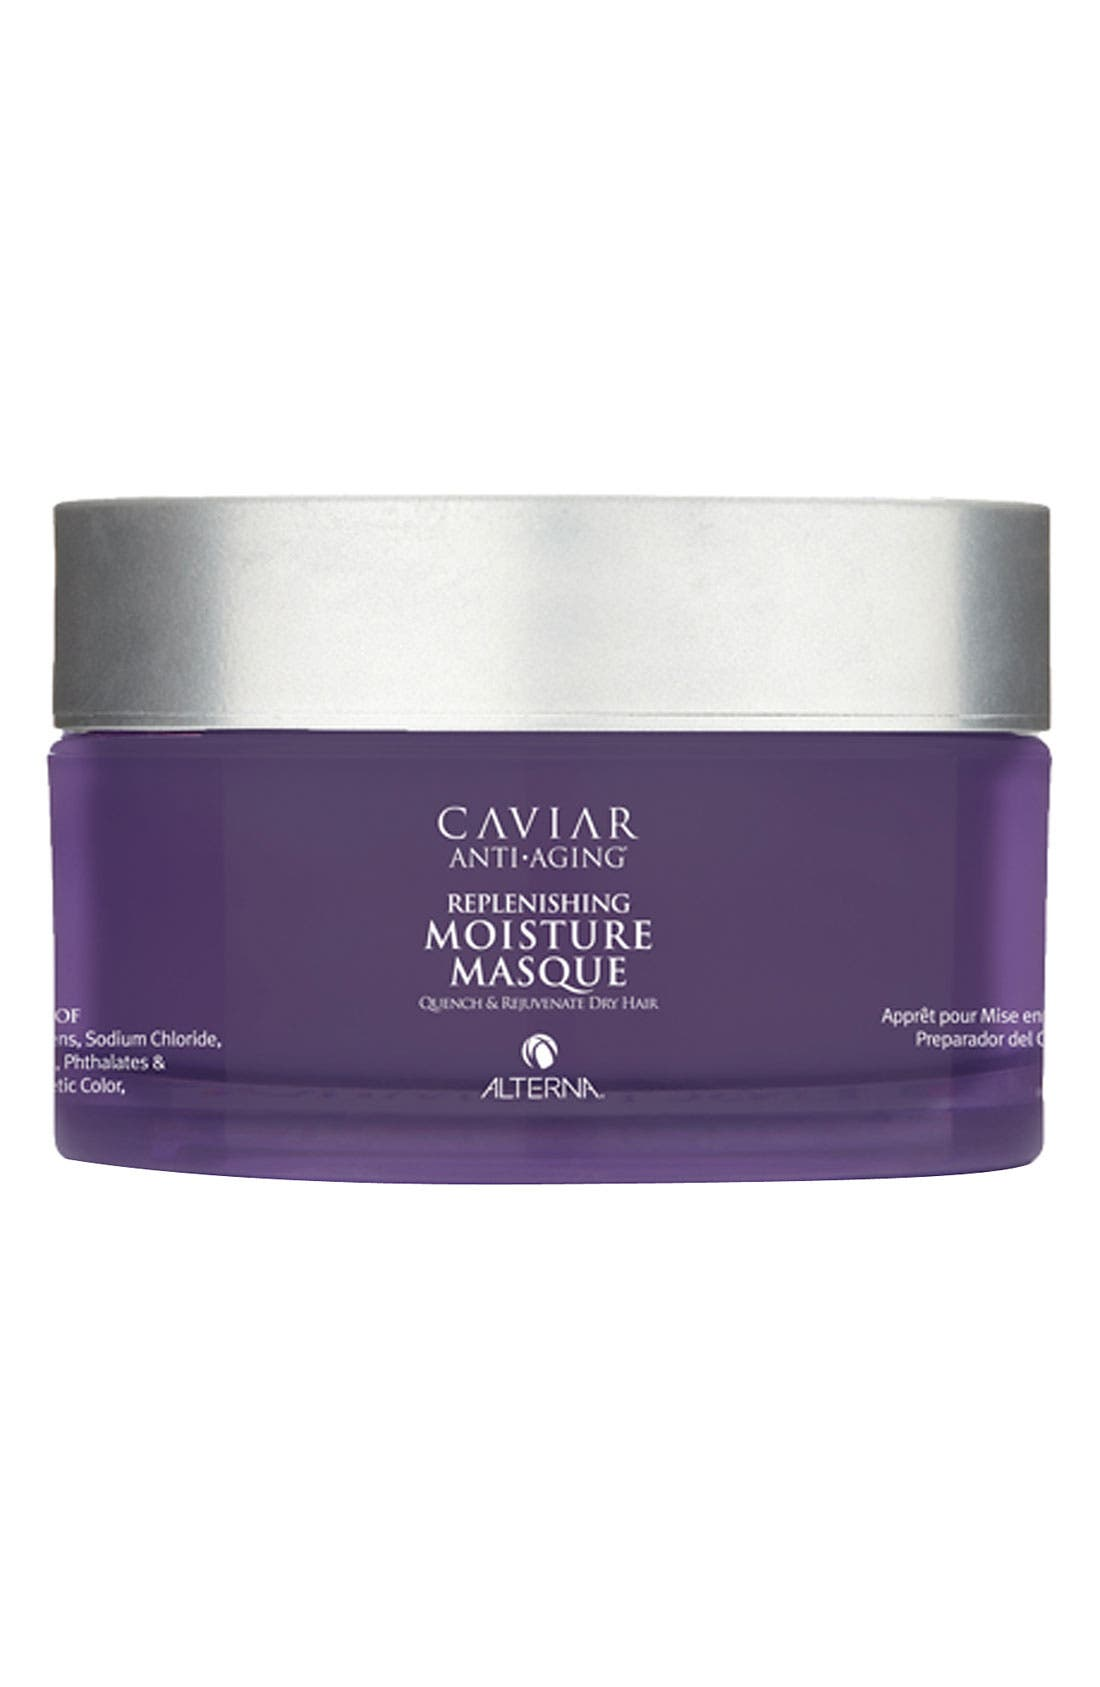 Caviar Anti-Aging Replenishing Moisture Masque,                         Main,                         color, 000